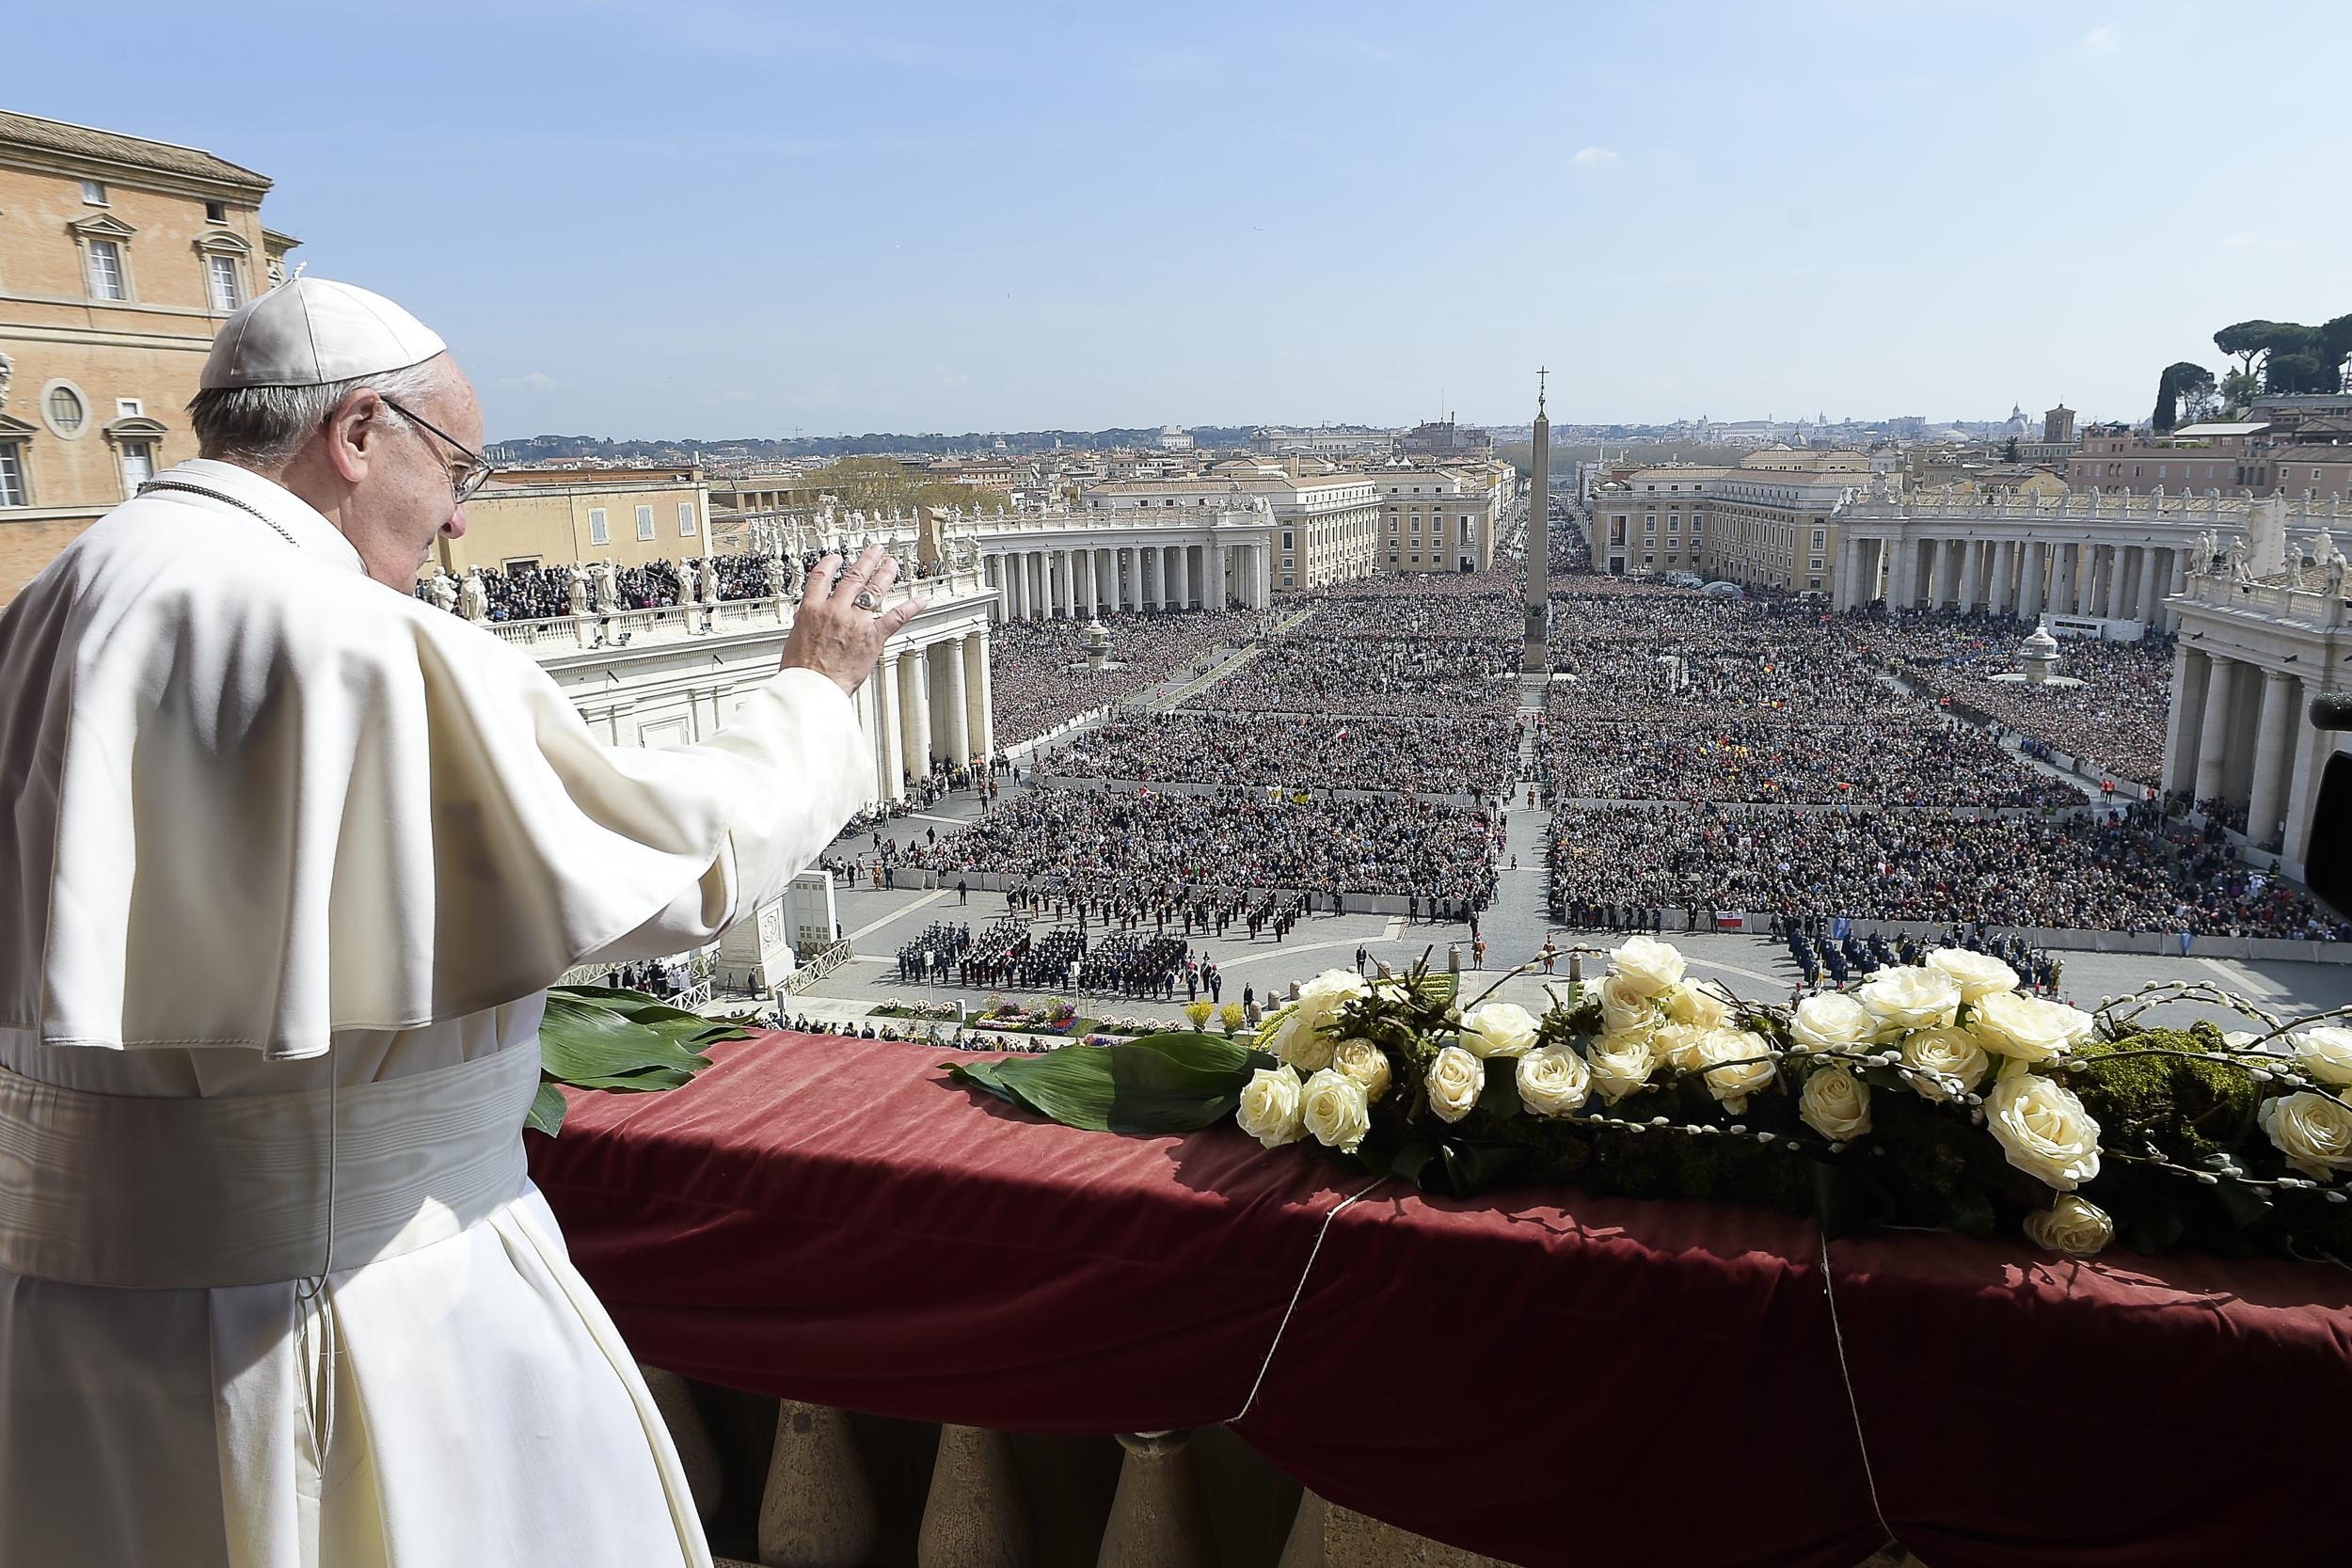 Bénédiction urbi et orbi, Pâques 2016 © L'Osservatore Romano